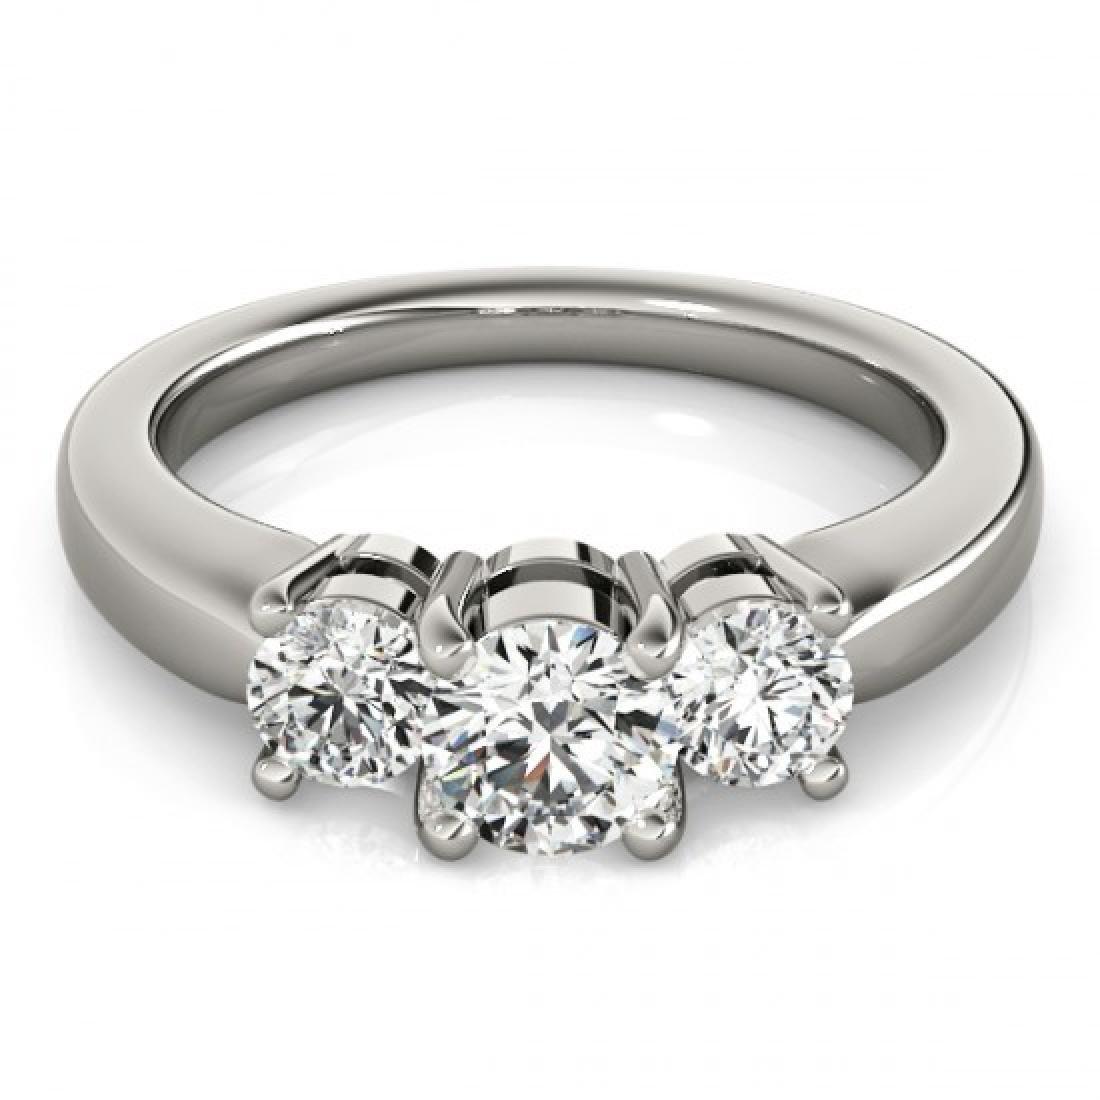 1.33 CTW Certified VS/SI Diamond 3 Stone Ring 14K White